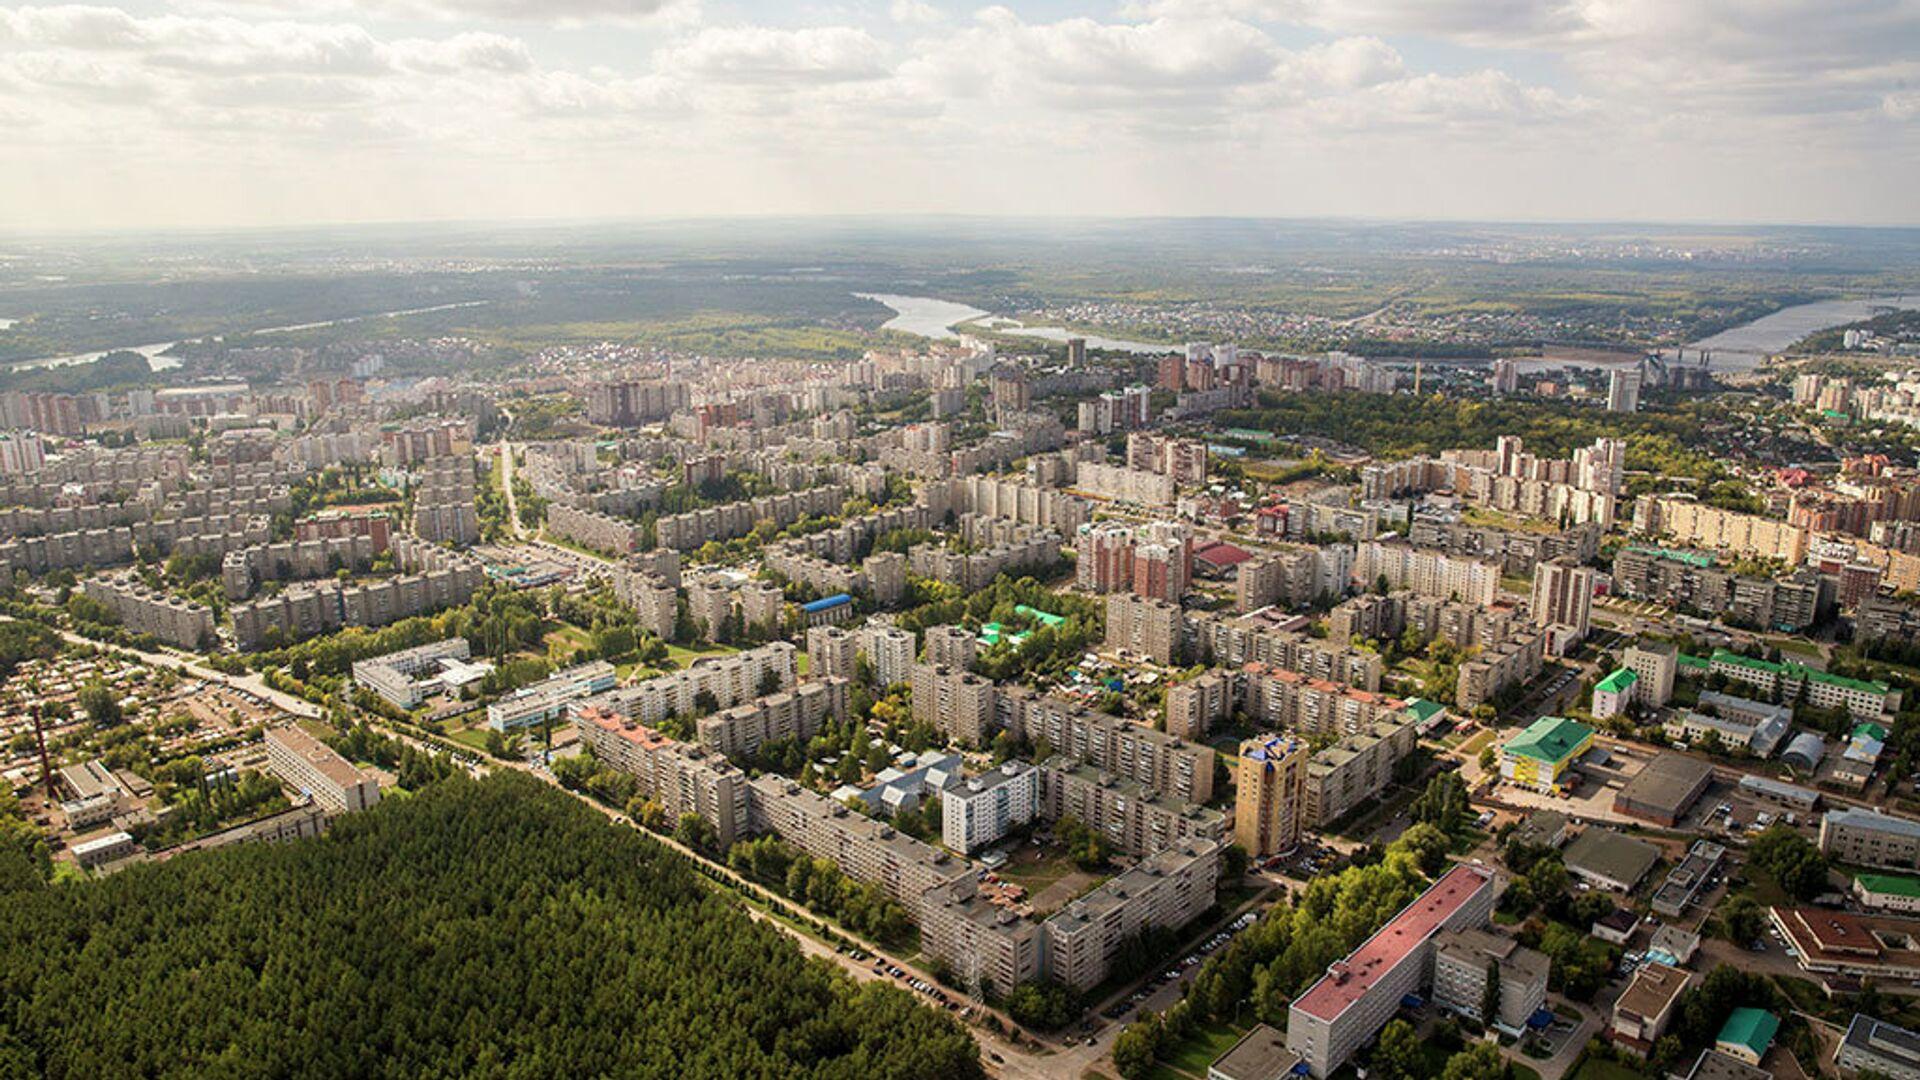 Вид с воздуха на город Уфа - РИА Новости, 1920, 26.01.2021